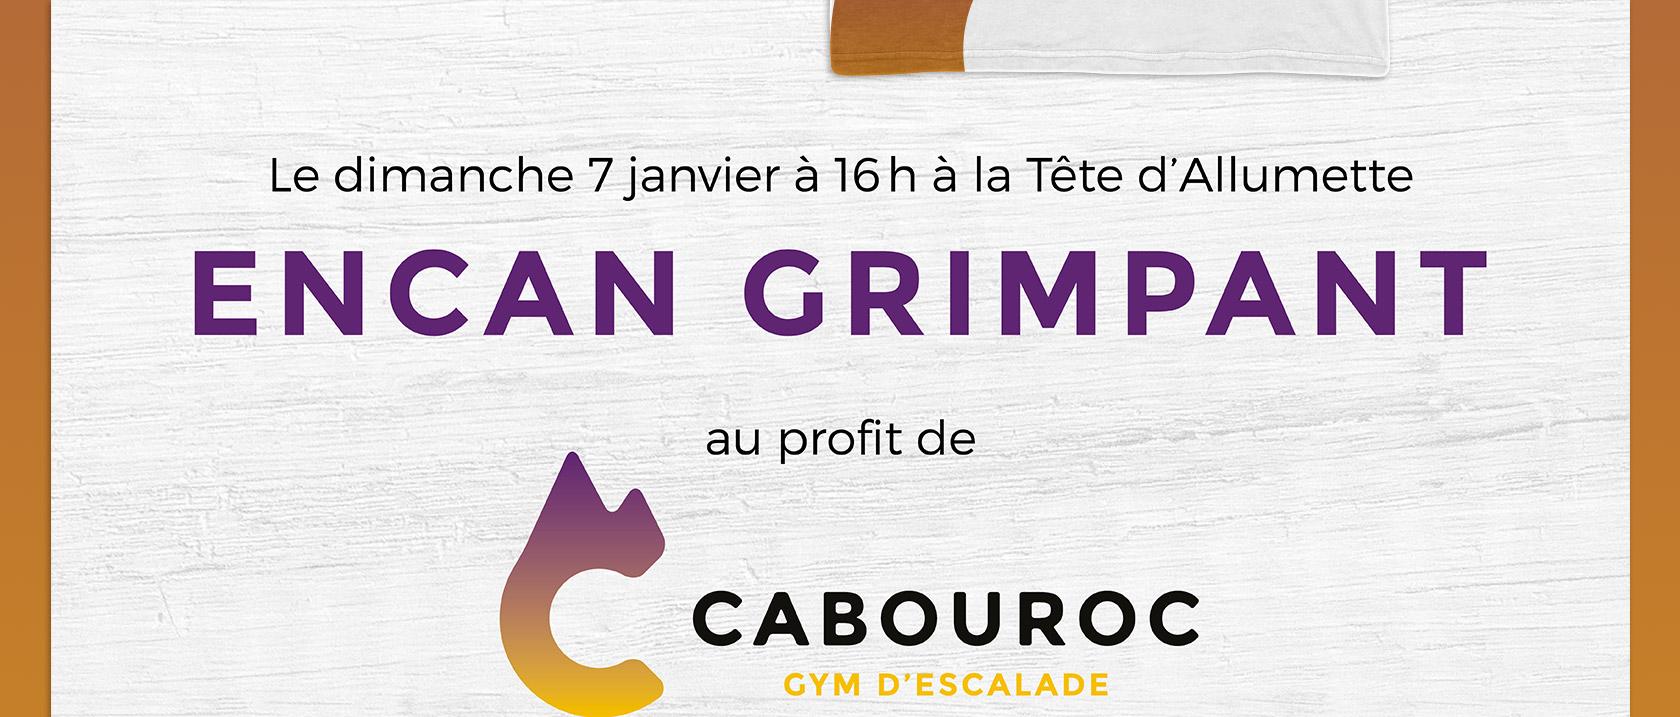 Agence-Phosphore-Portfolio-Branding-Cabouroc_08